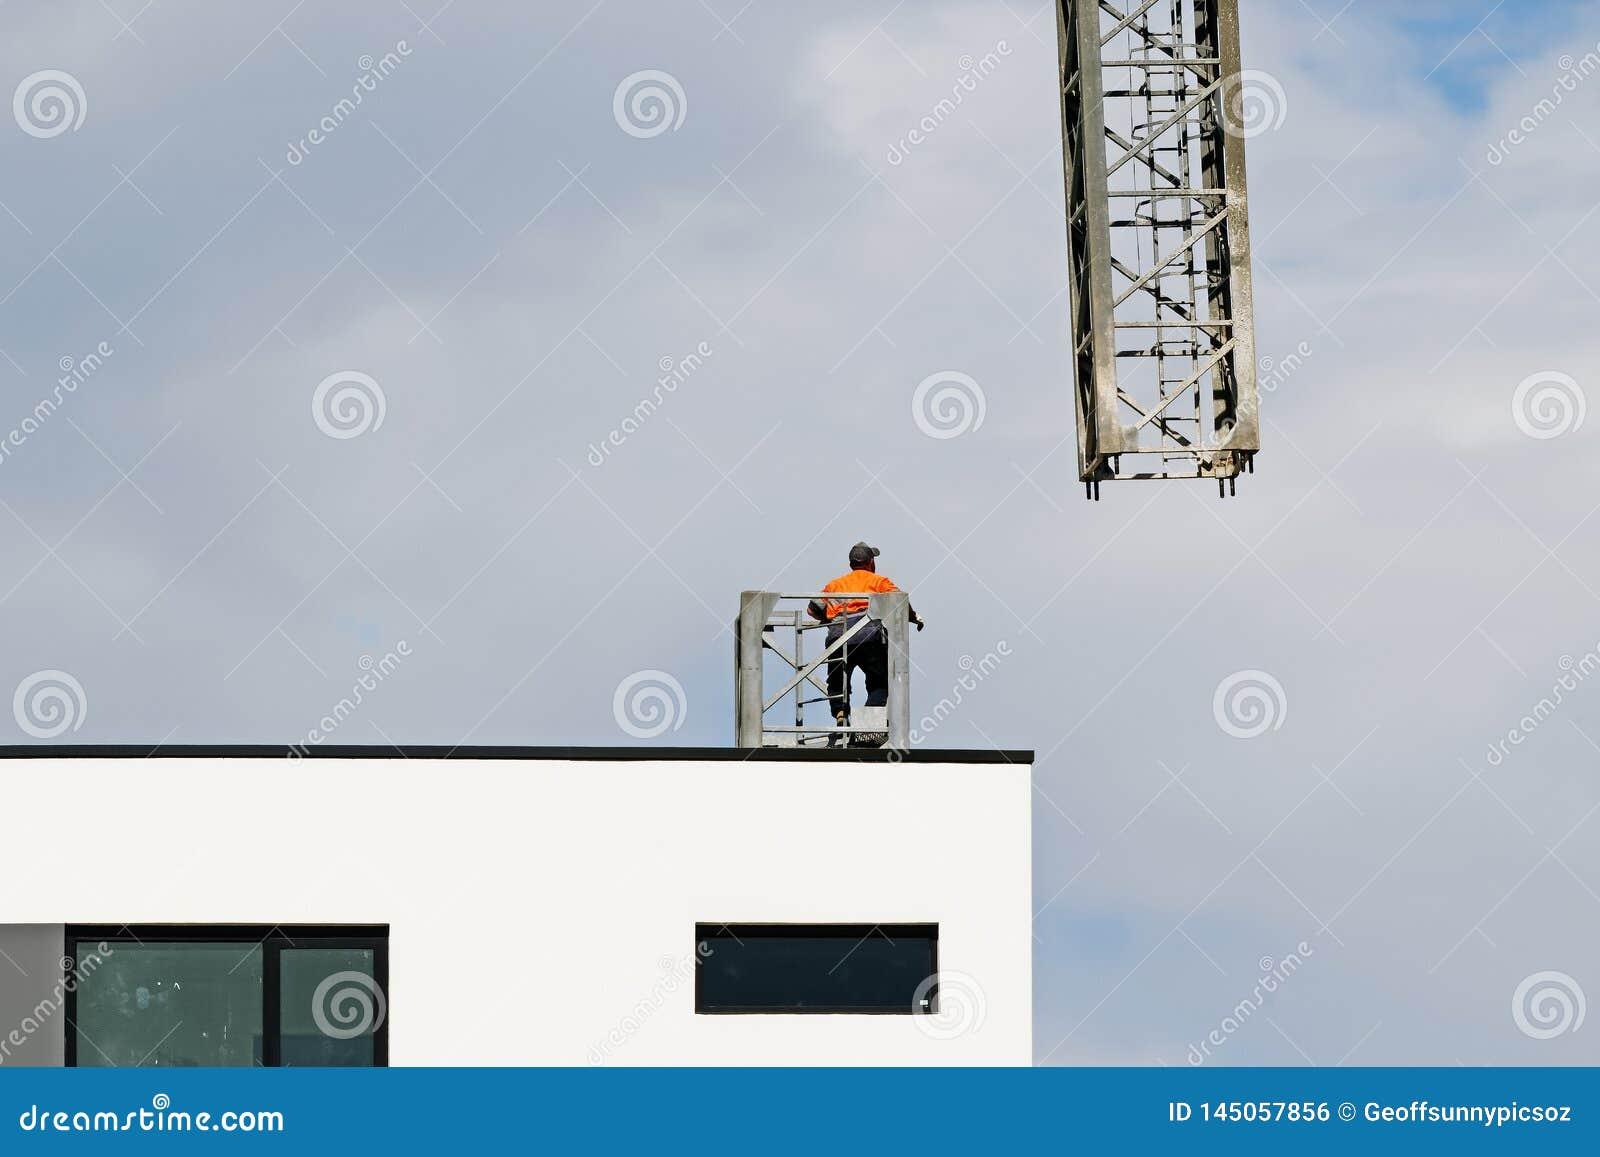 Construction crane removal. Update ed324. Gosford. April 9, 2019